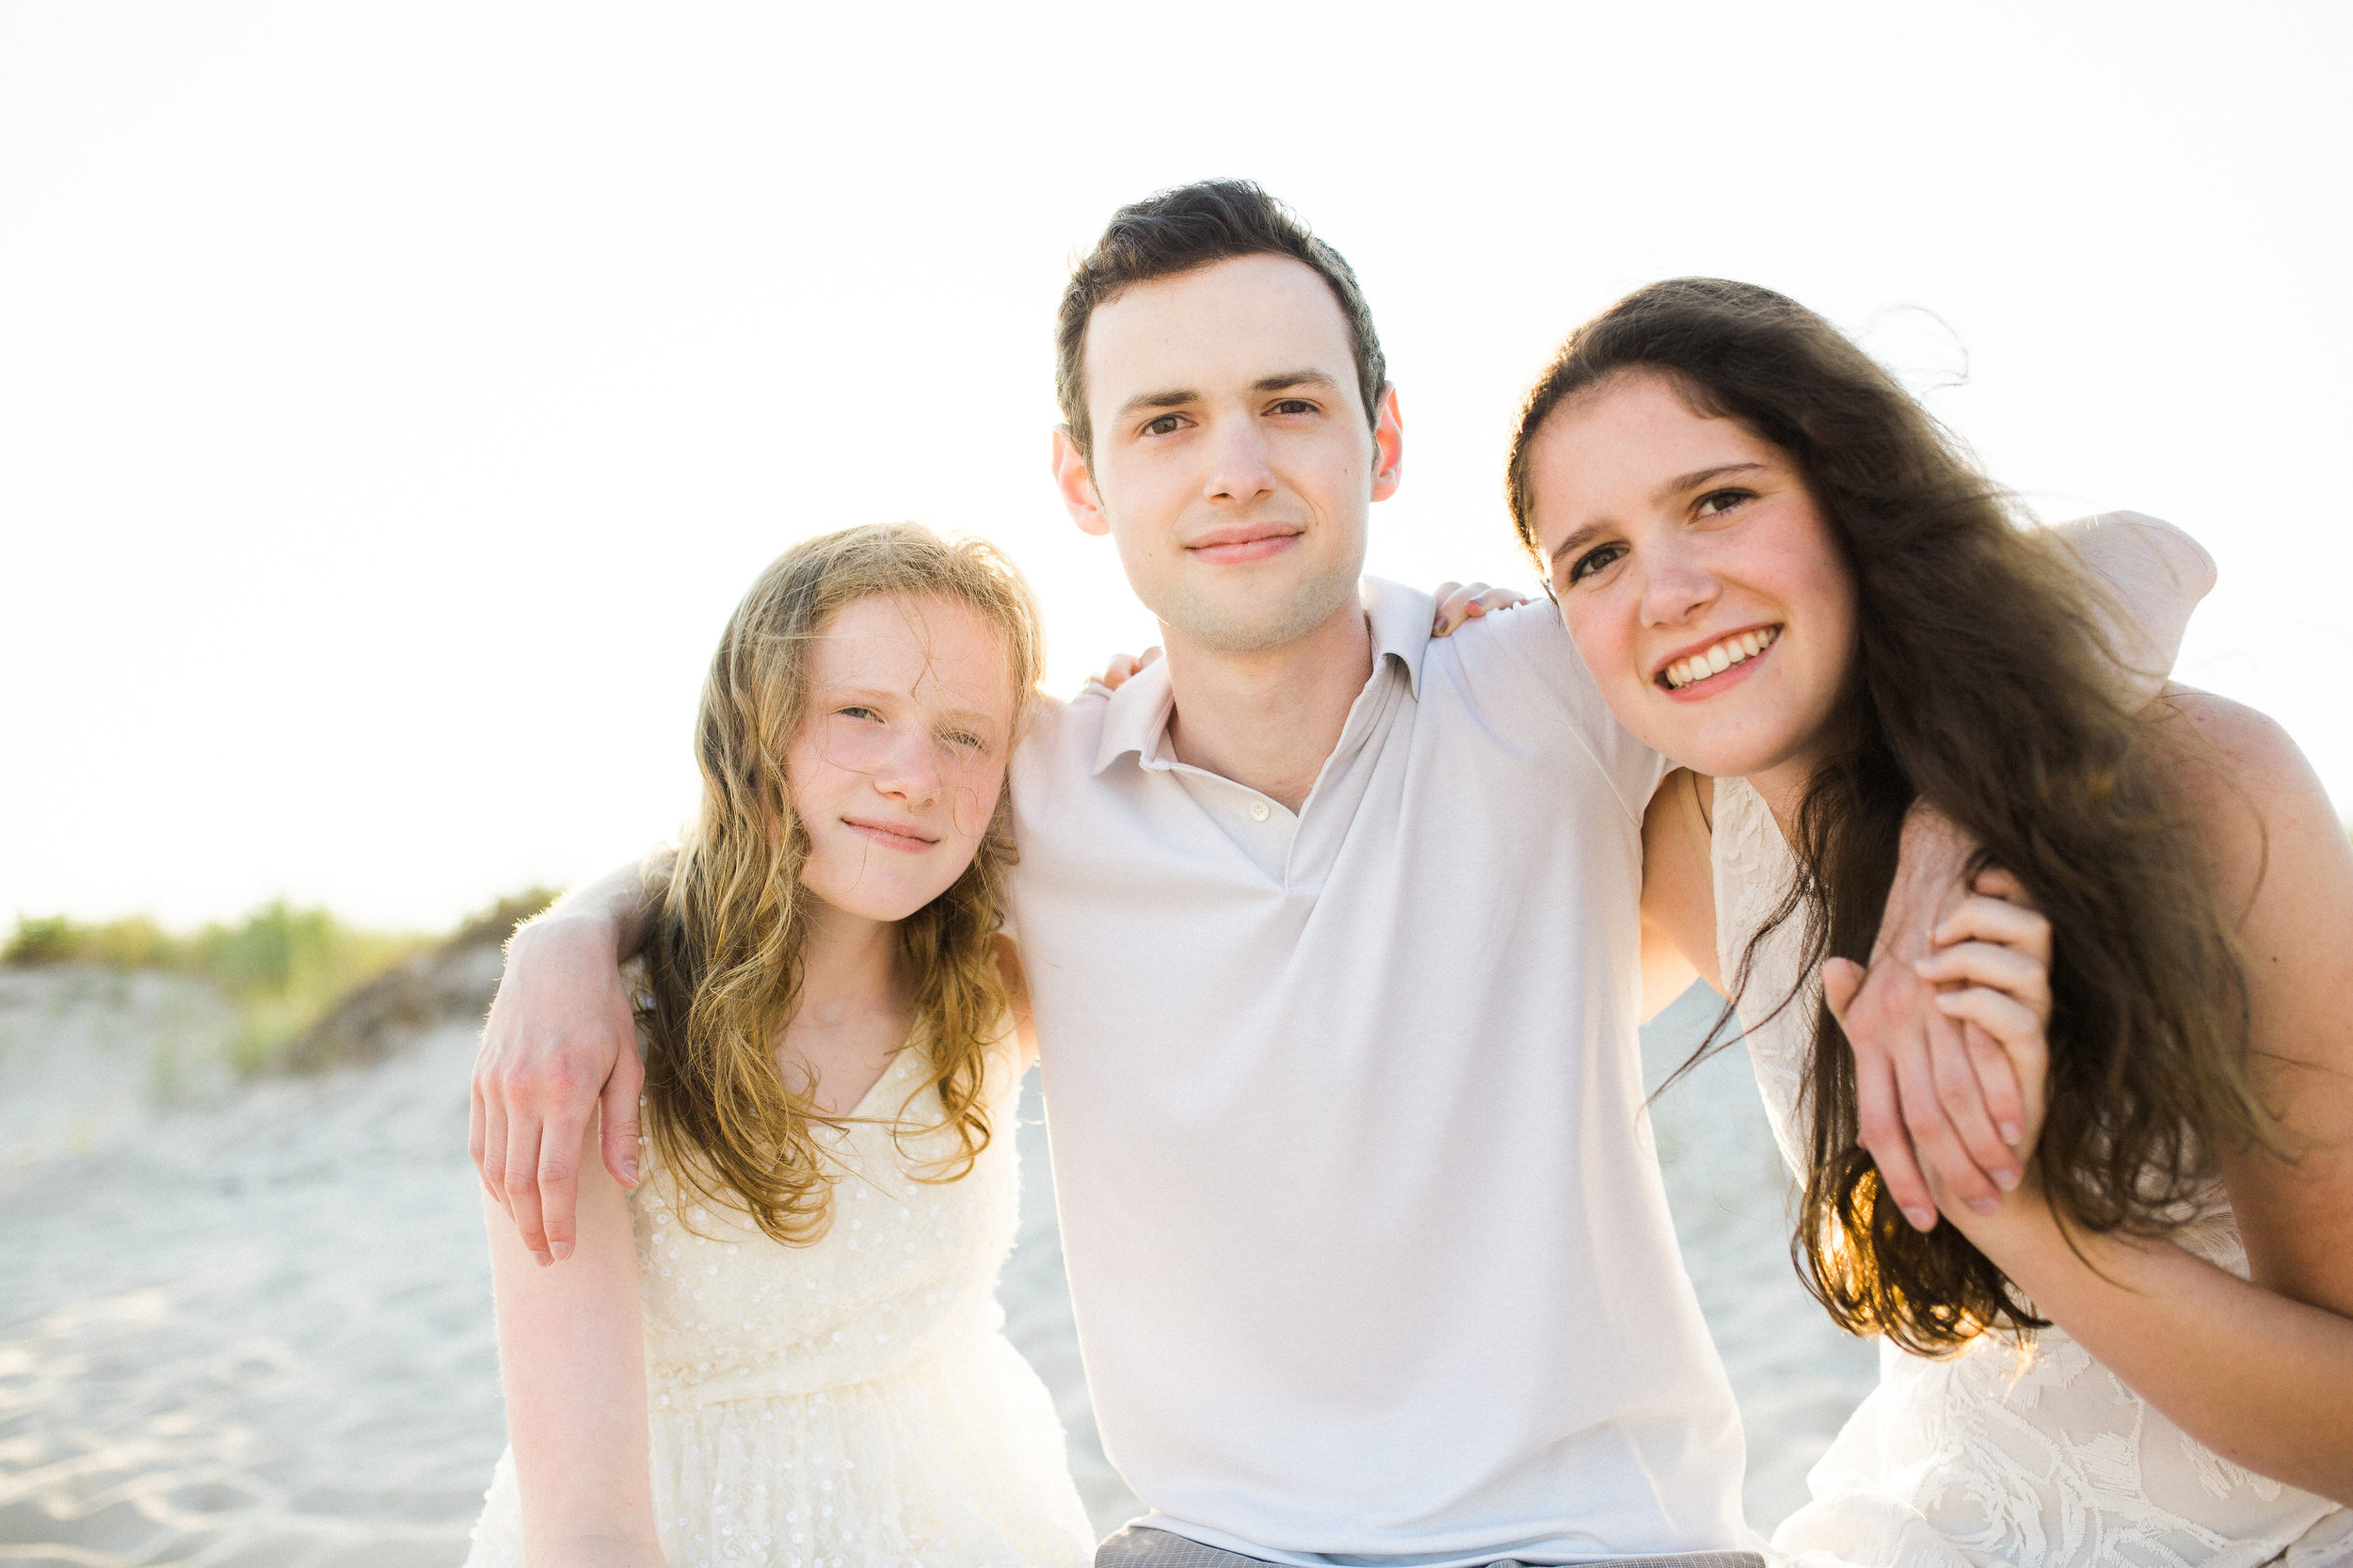 hamptons_beach_family_child_photographer-11.jpg